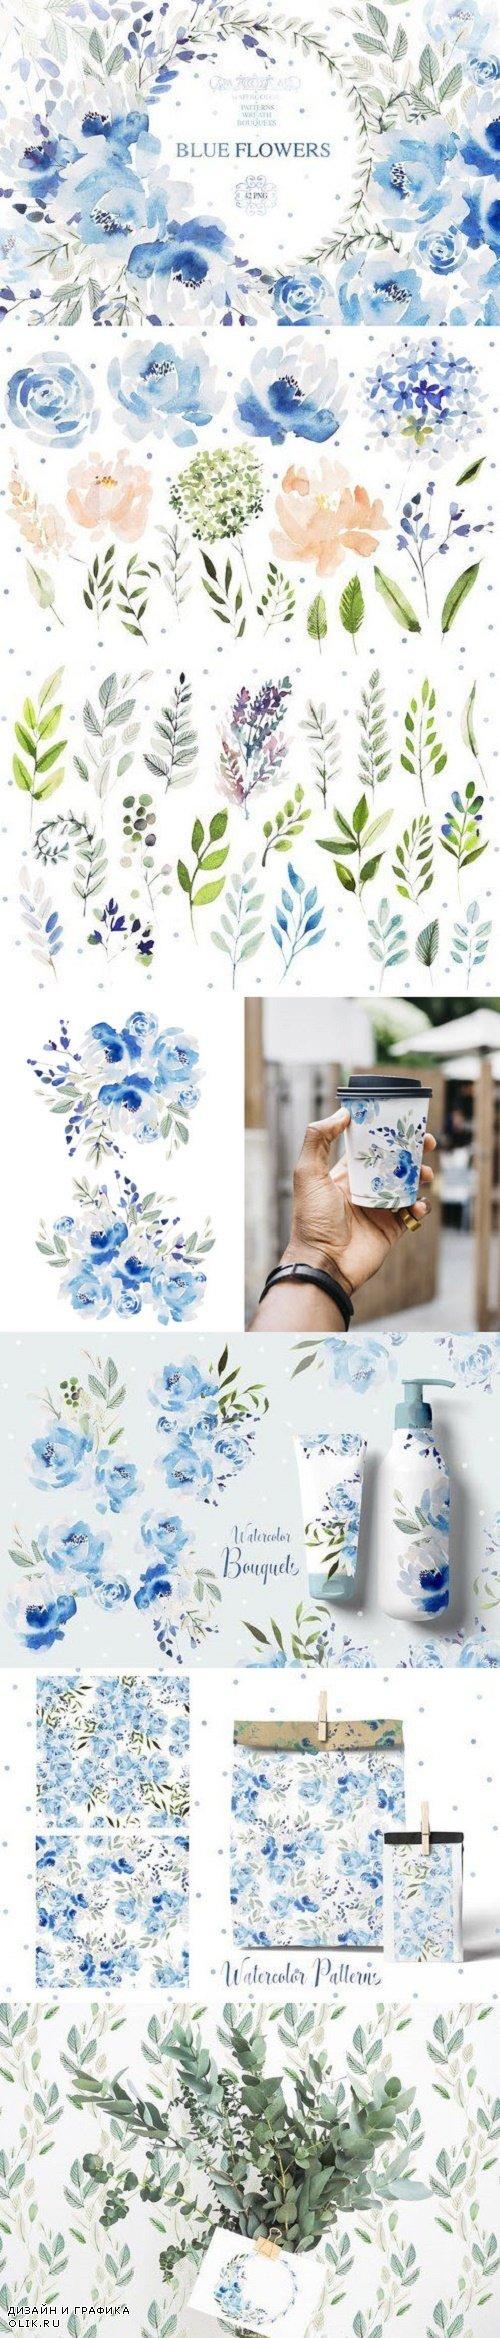 Watercolor BLUE FLOWERS - 3723209